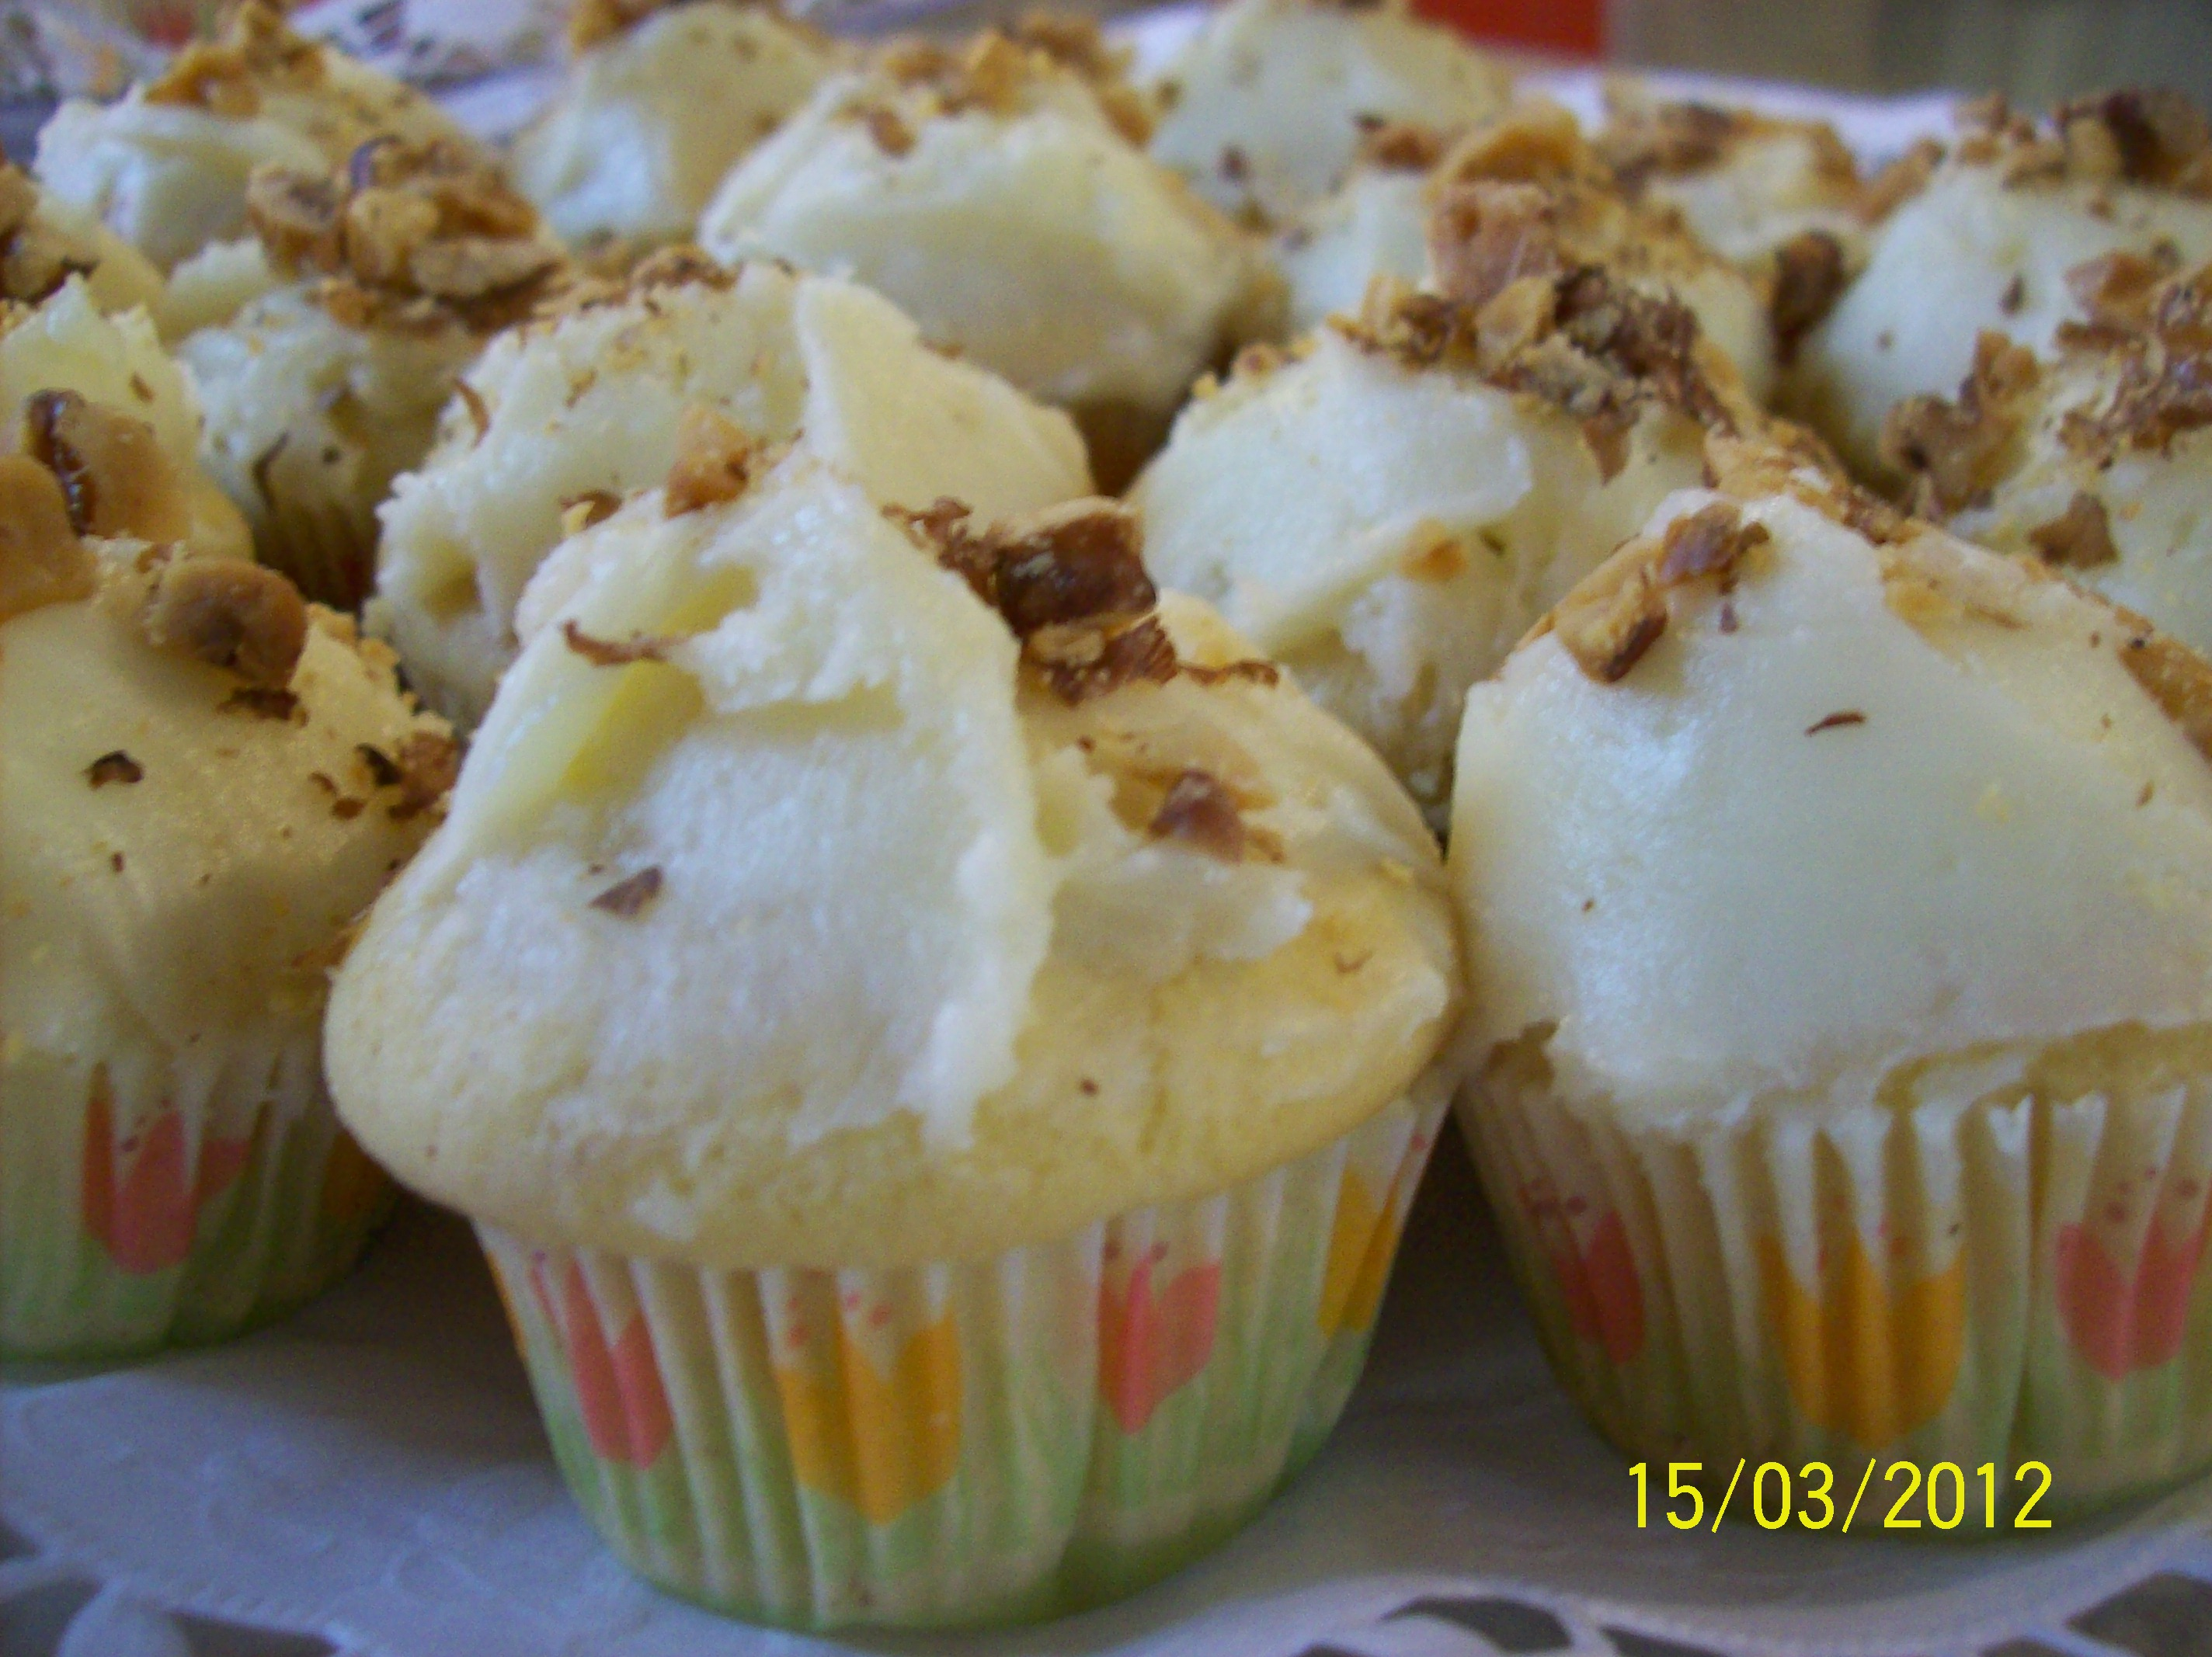 Miniature Guilt Free Maple Coconut Cupcakes